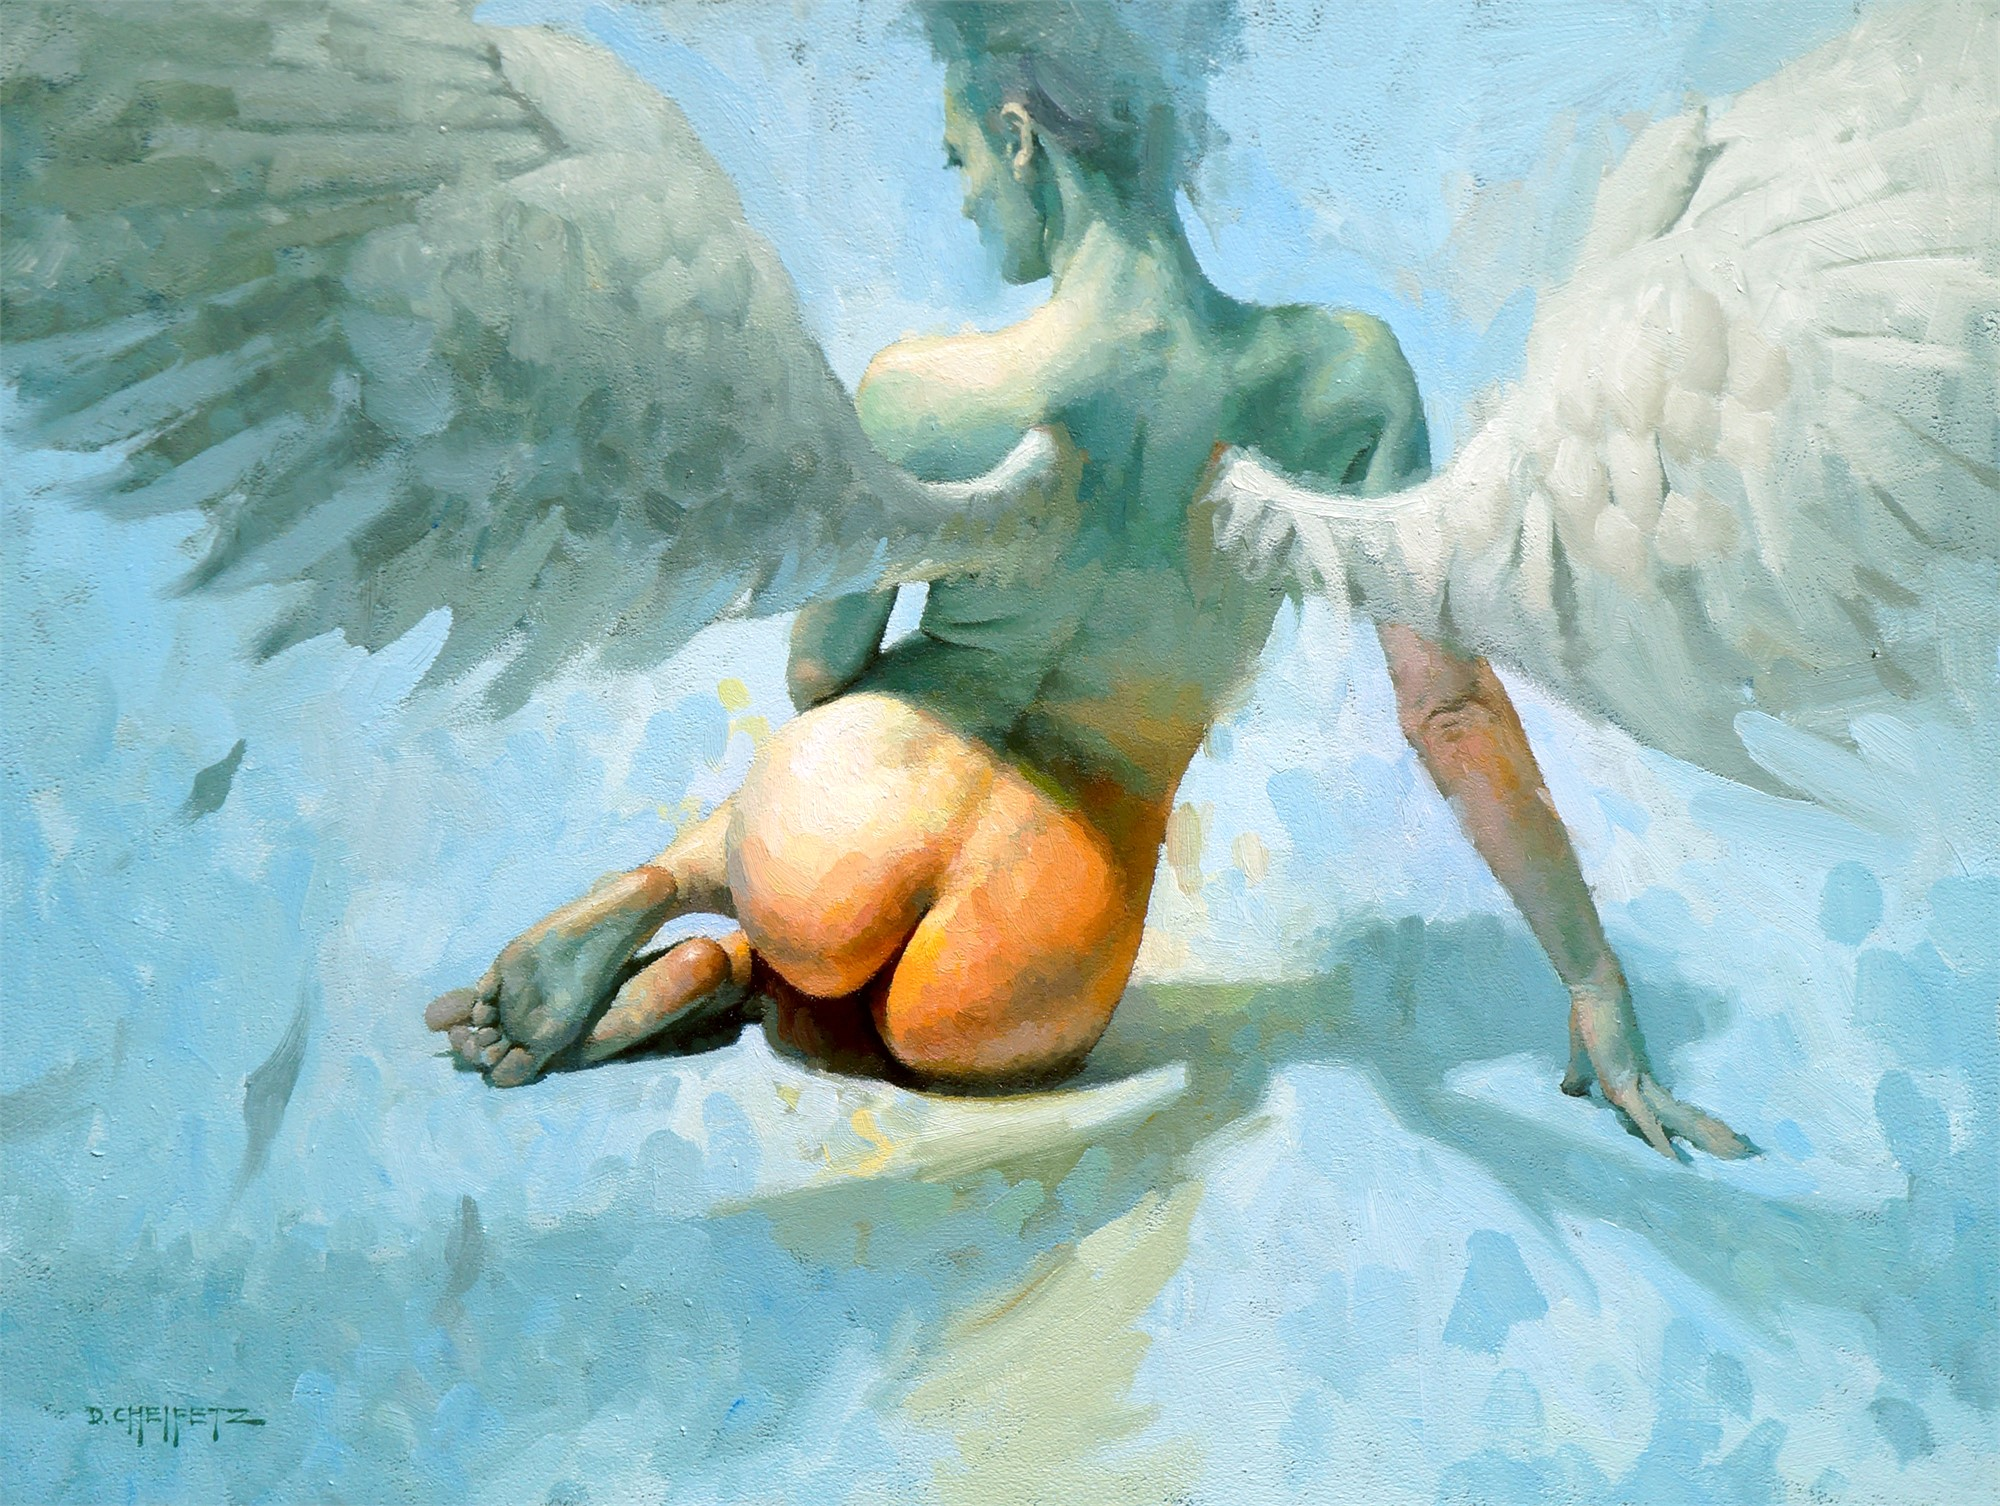 Seraph by David Cheifetz